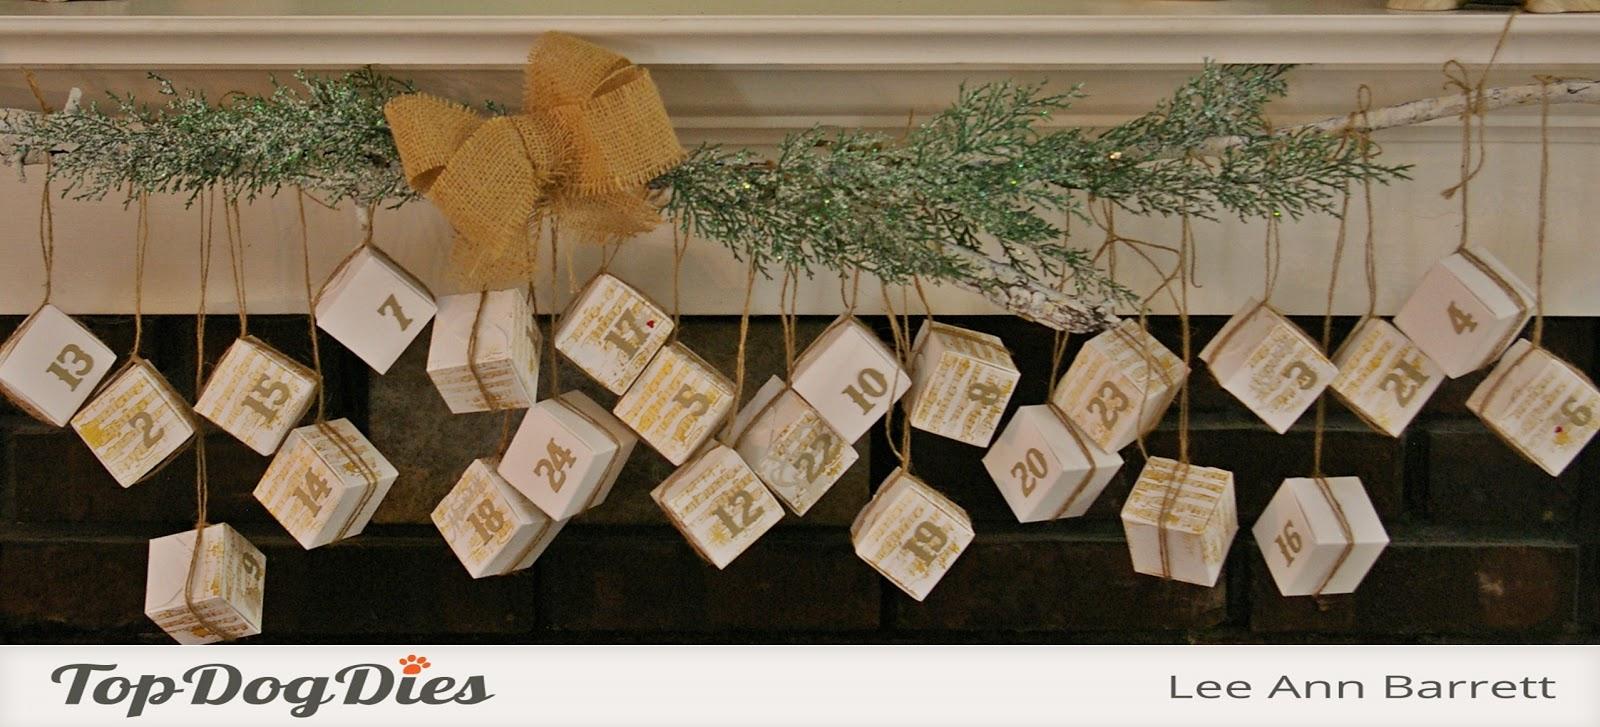 greyt paper crafts an advent calendar with top dog dies